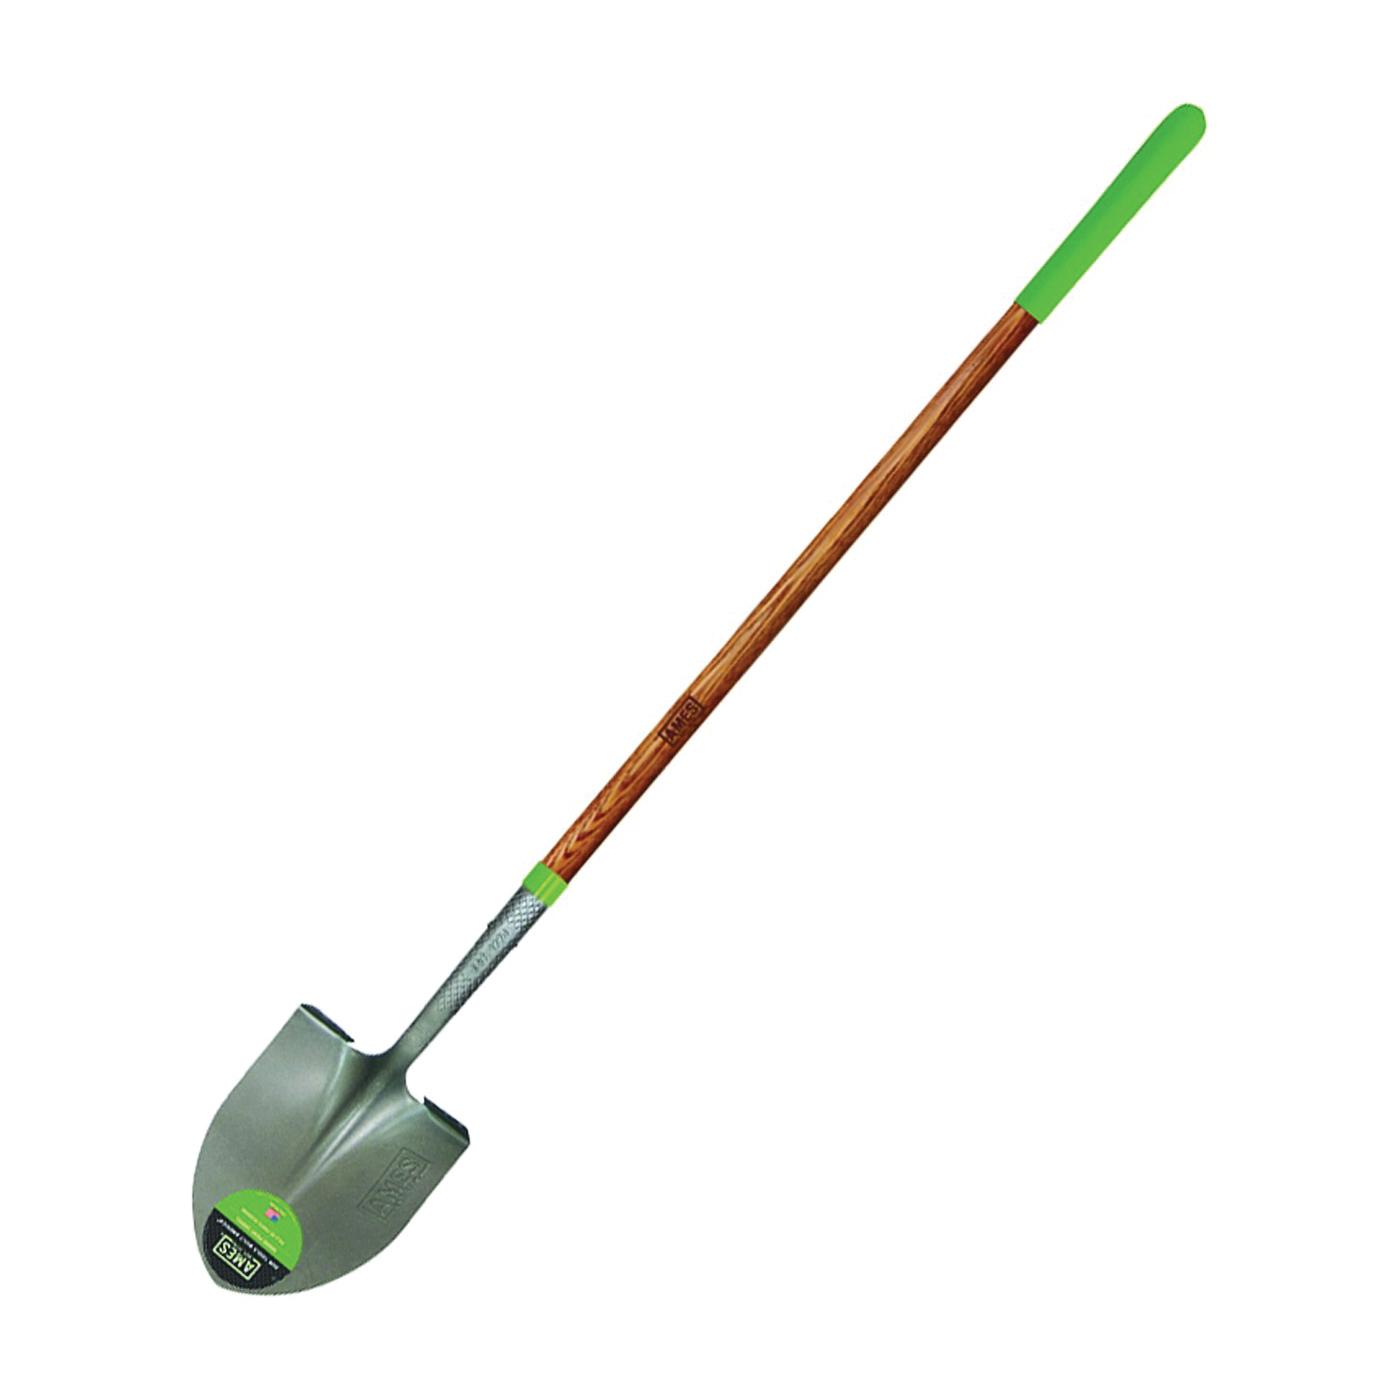 Picture of AMES 2535600 Shovel, 8-3/4 in W Blade, Steel Blade, Hardwood Handle, Long Handle, 48 in L Handle